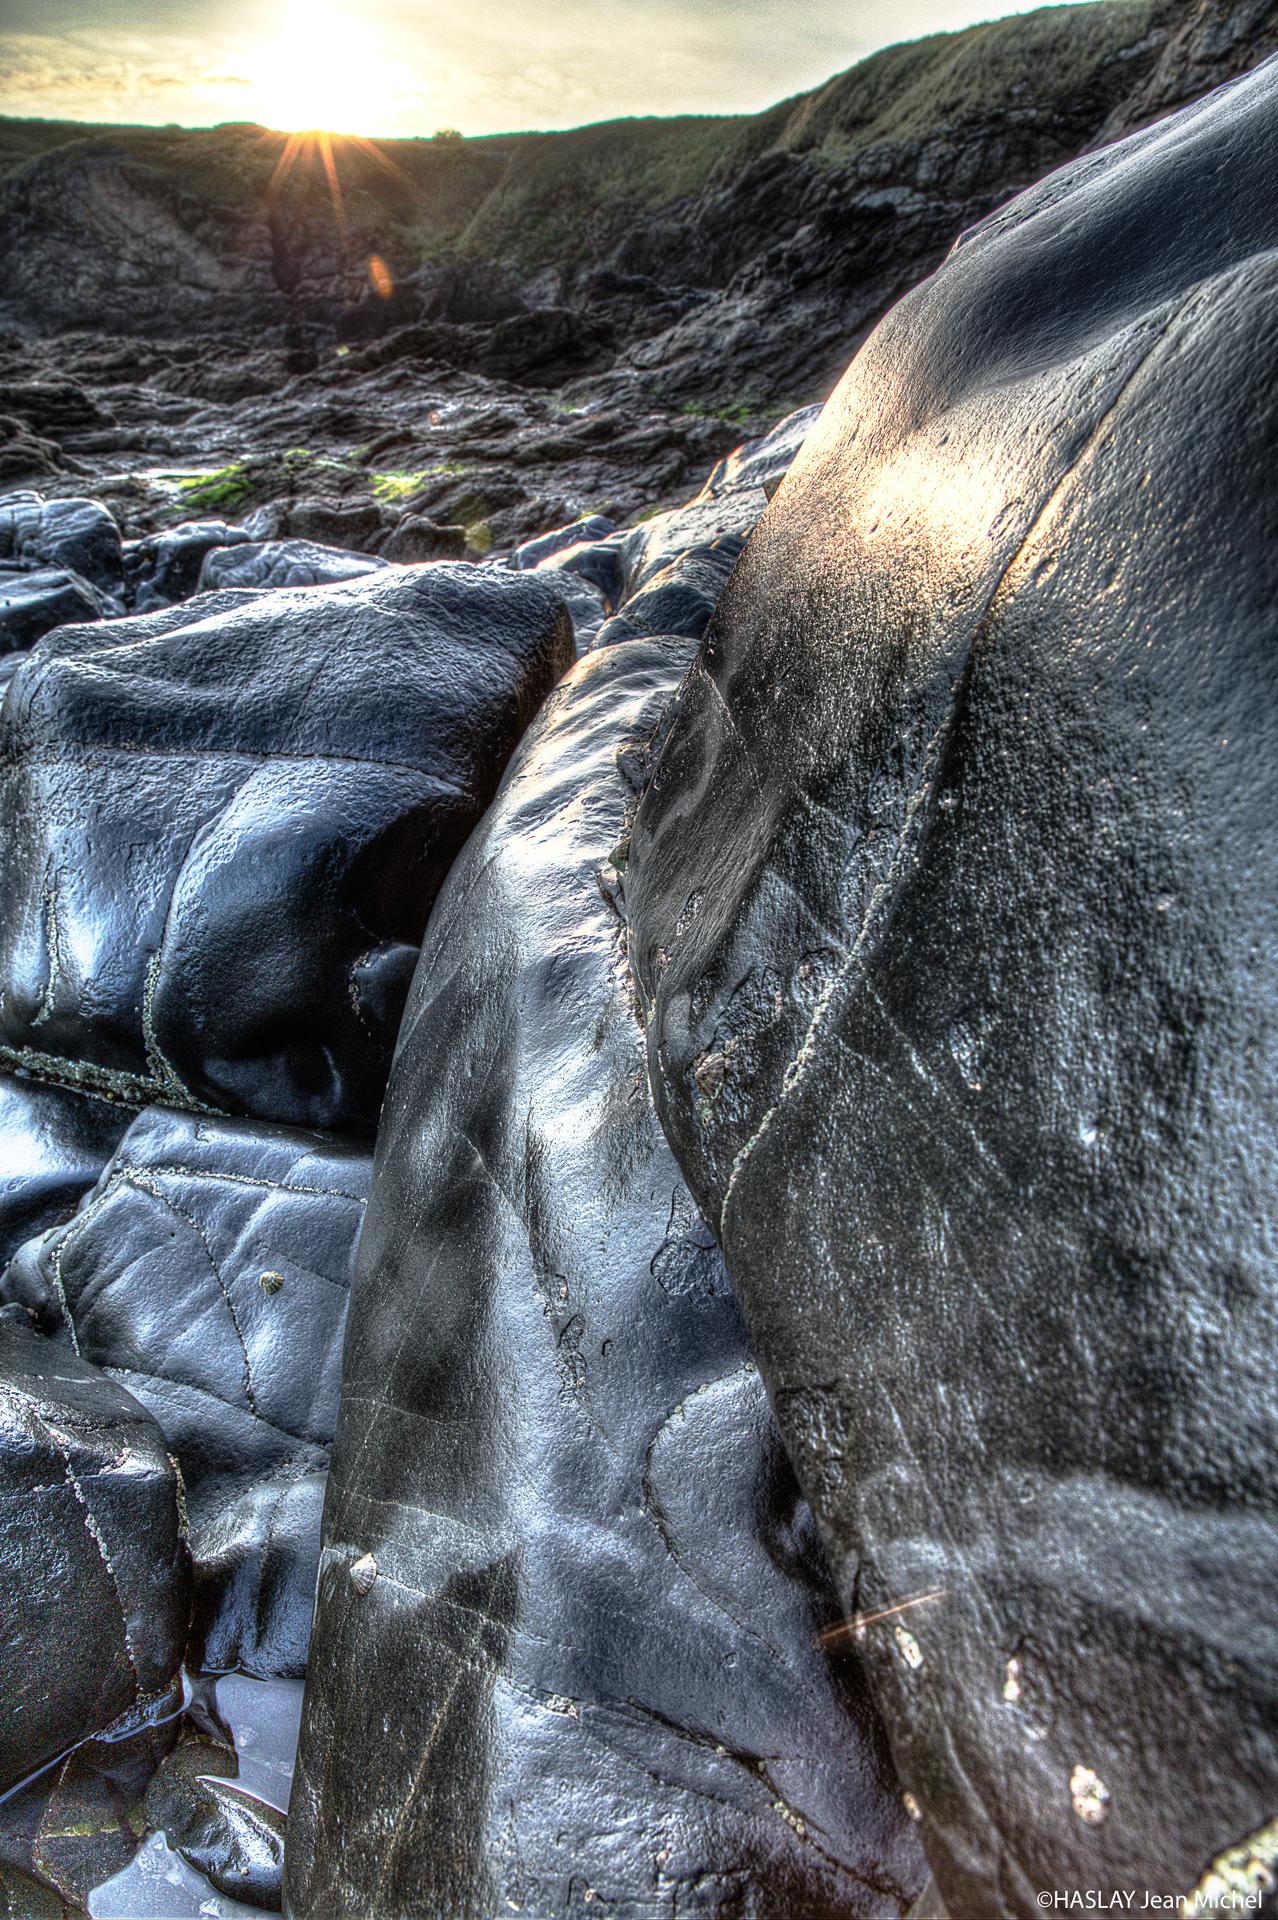 Peau de pierre 7